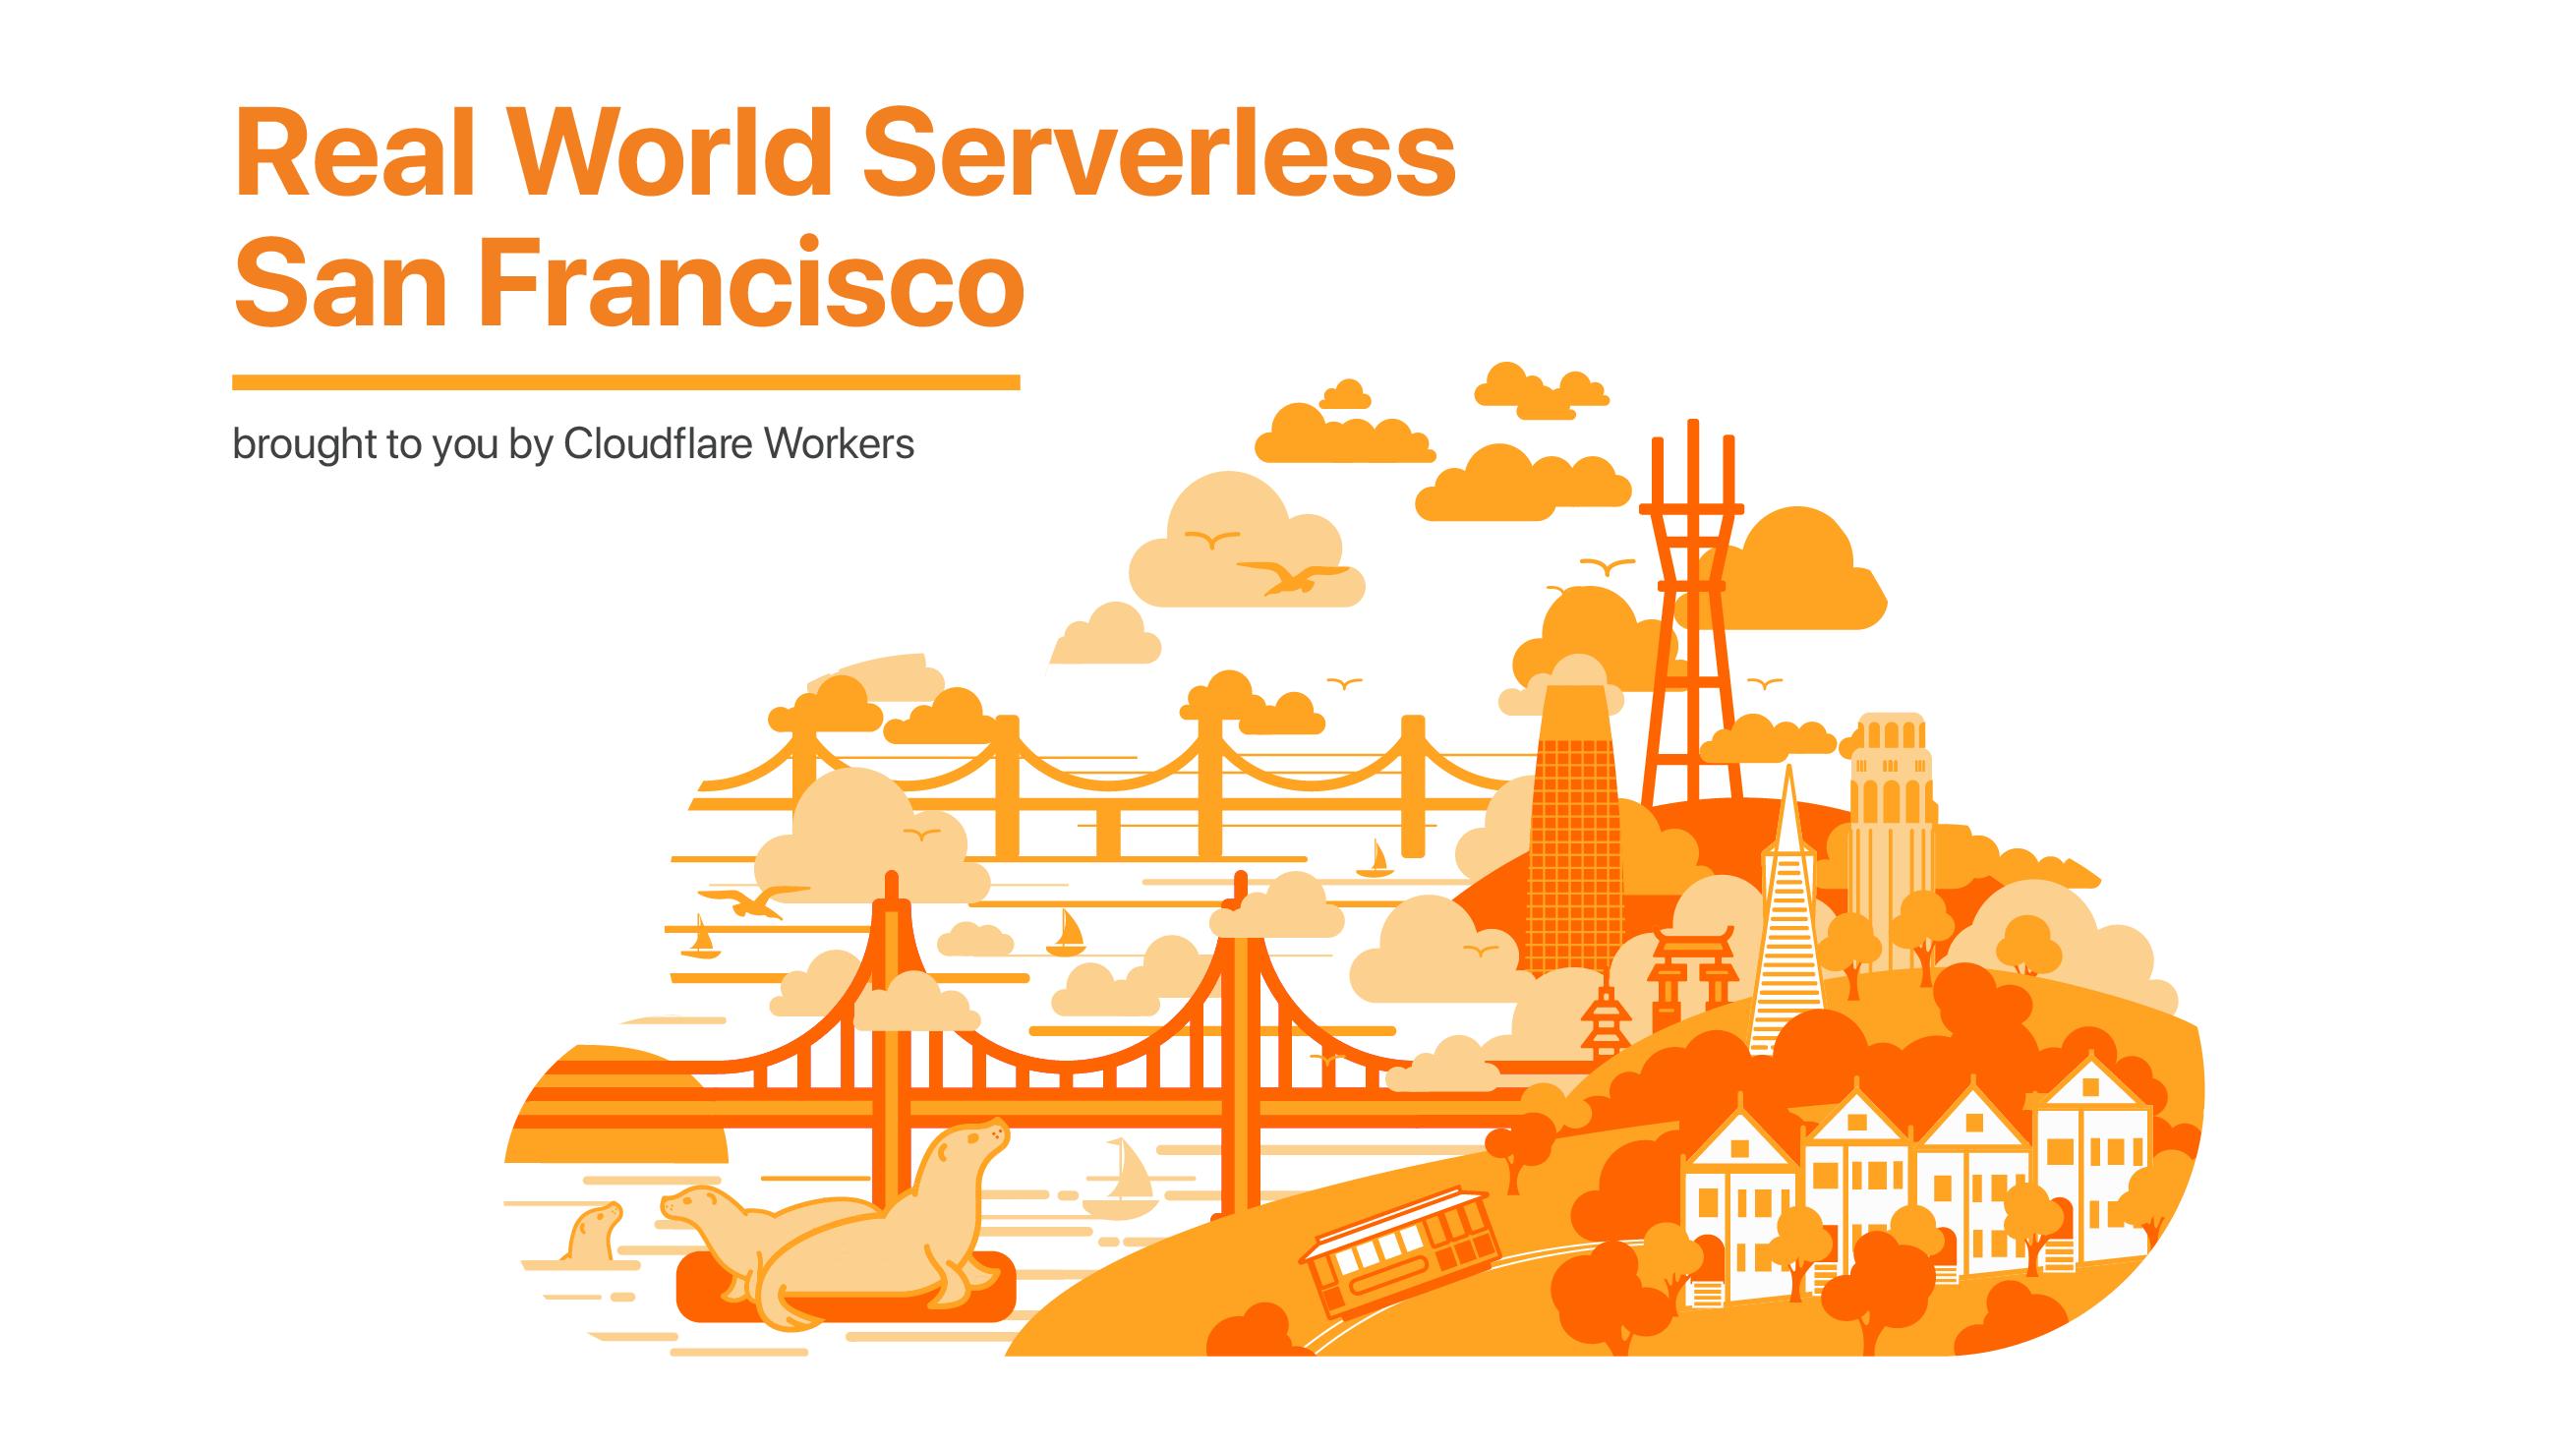 Real World Serverless - San Francisco